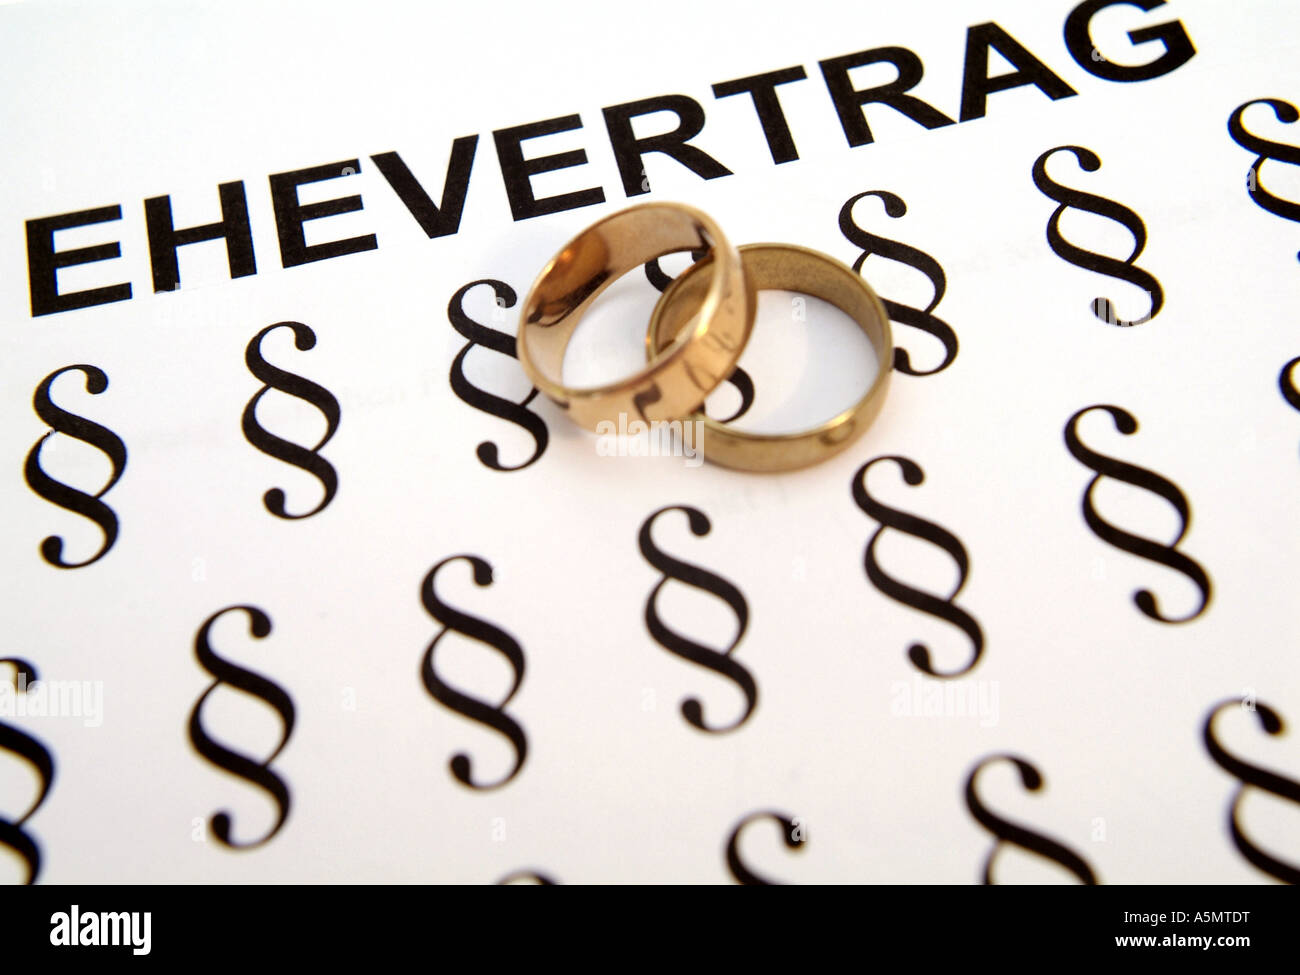 Symbolbild Ehevertrag symbolic for marriage contract Stock Photo